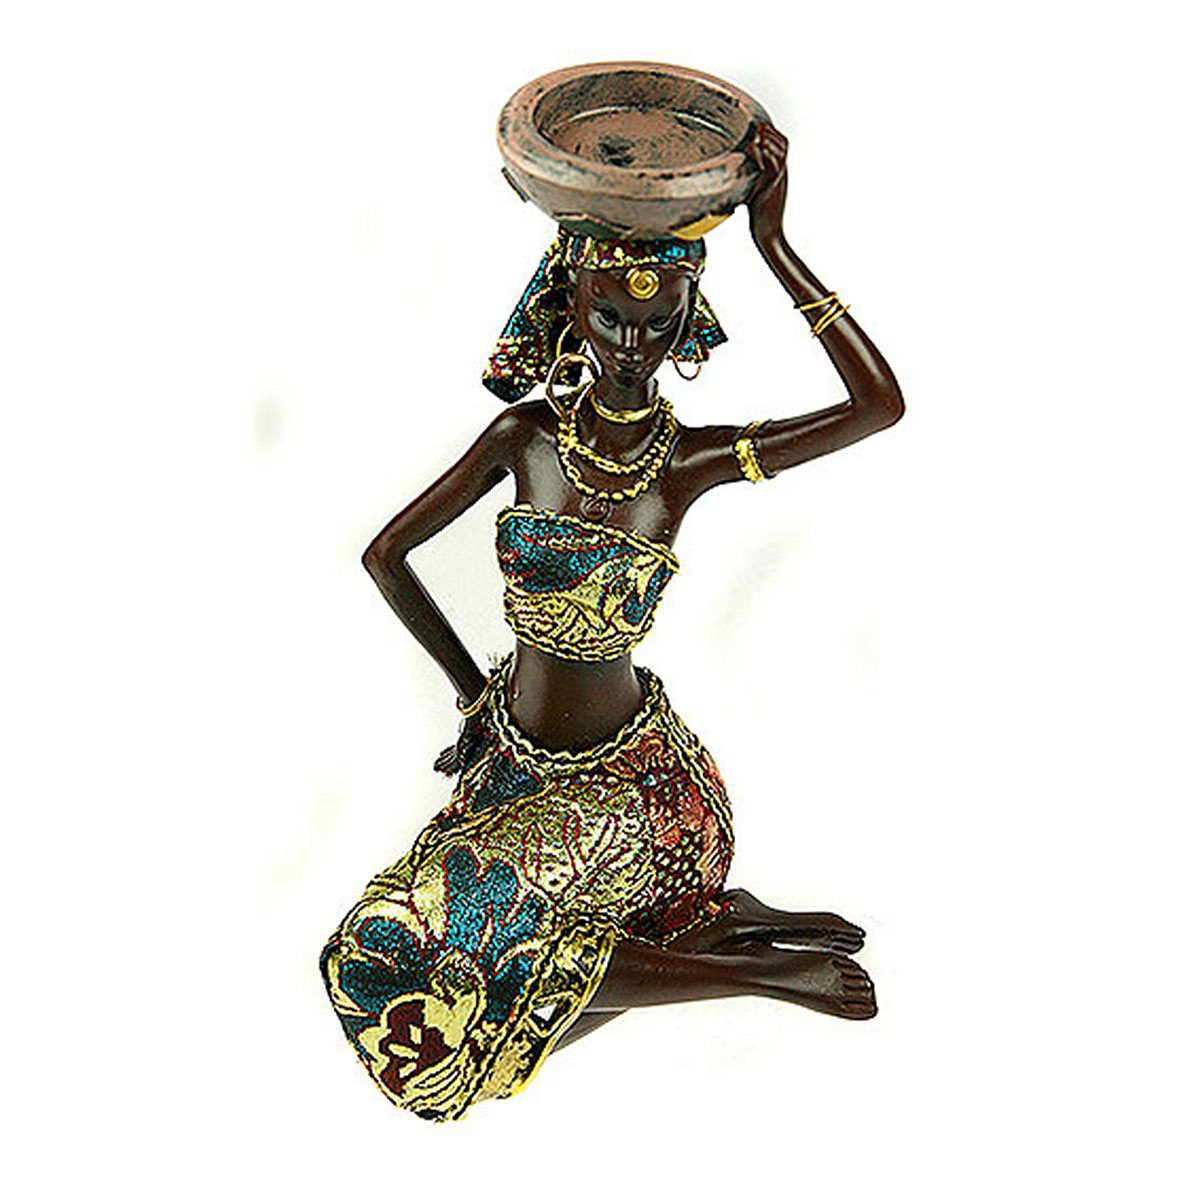 Статуэтка Русские Подарки Африканка, 14 х 15 х 22 см статуэтка русские подарки африканка 11 х 15 х 24 см